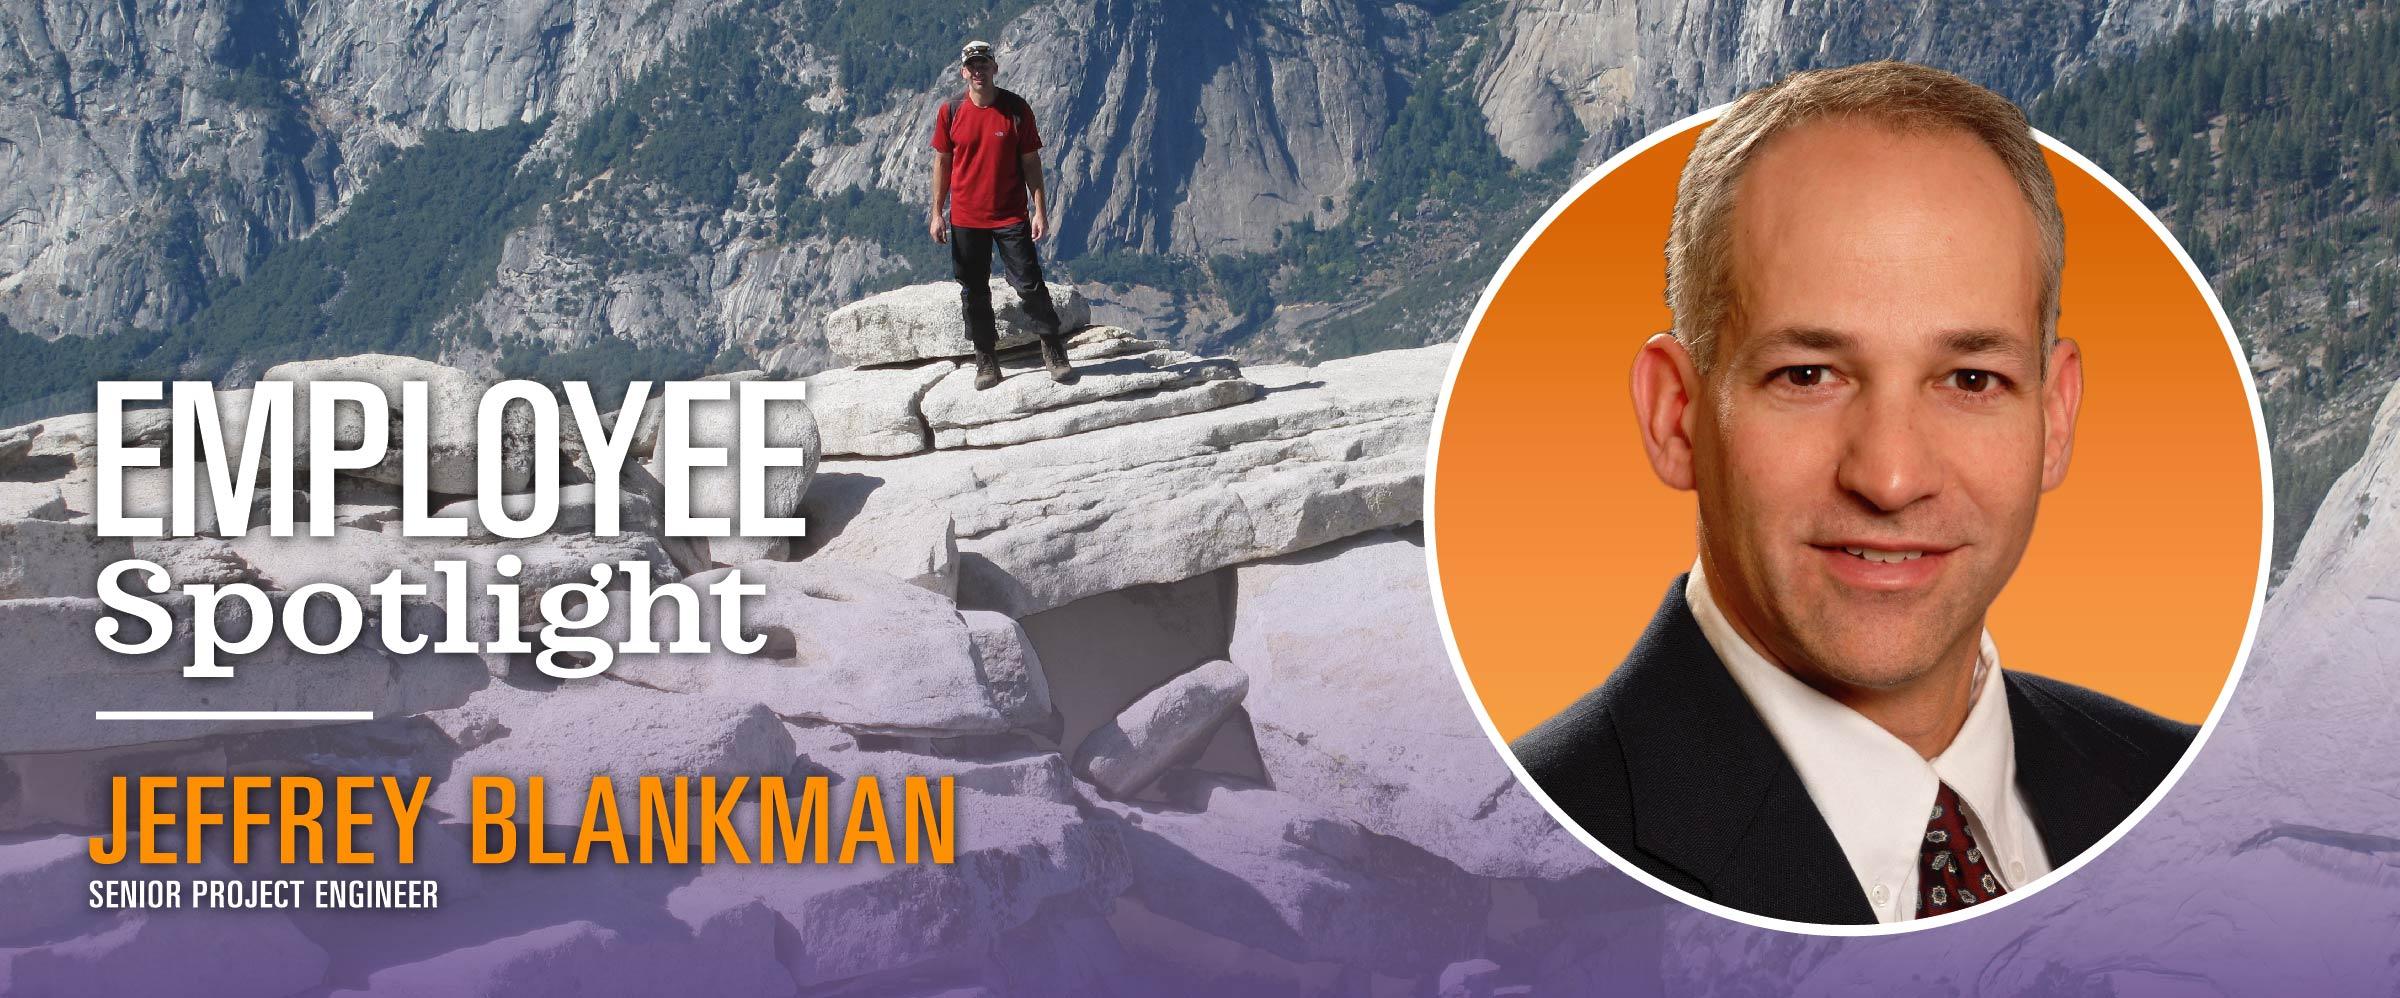 Jeff Blankman McCormick & Company